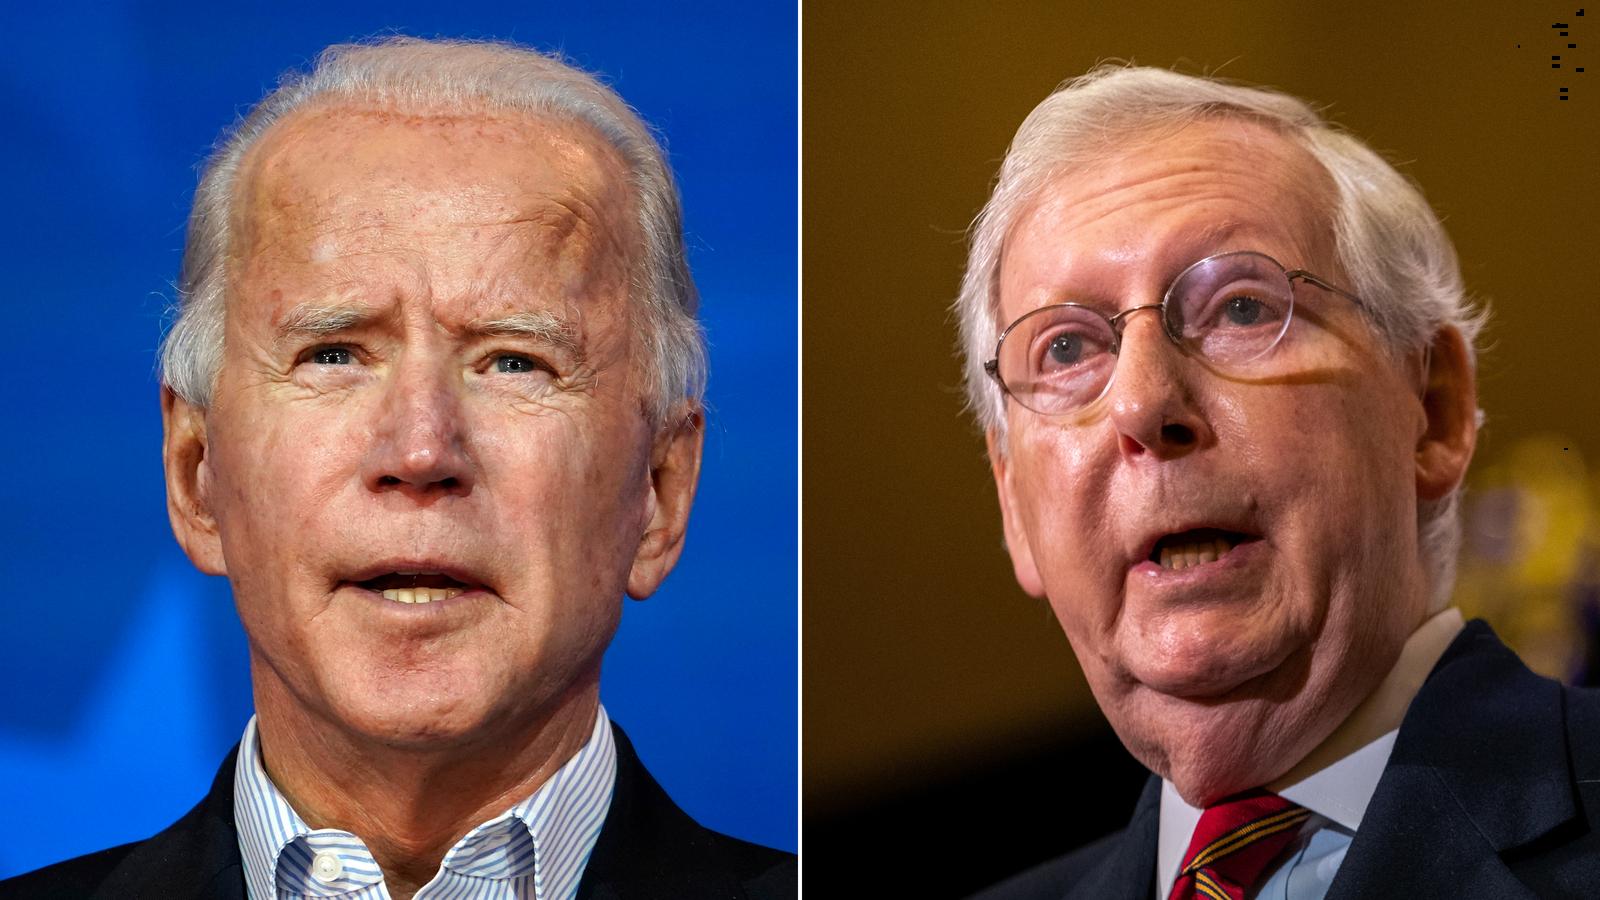 McConnell warns Democratic tactics to push Biden priorities could sink bipartisan infrastructure deal